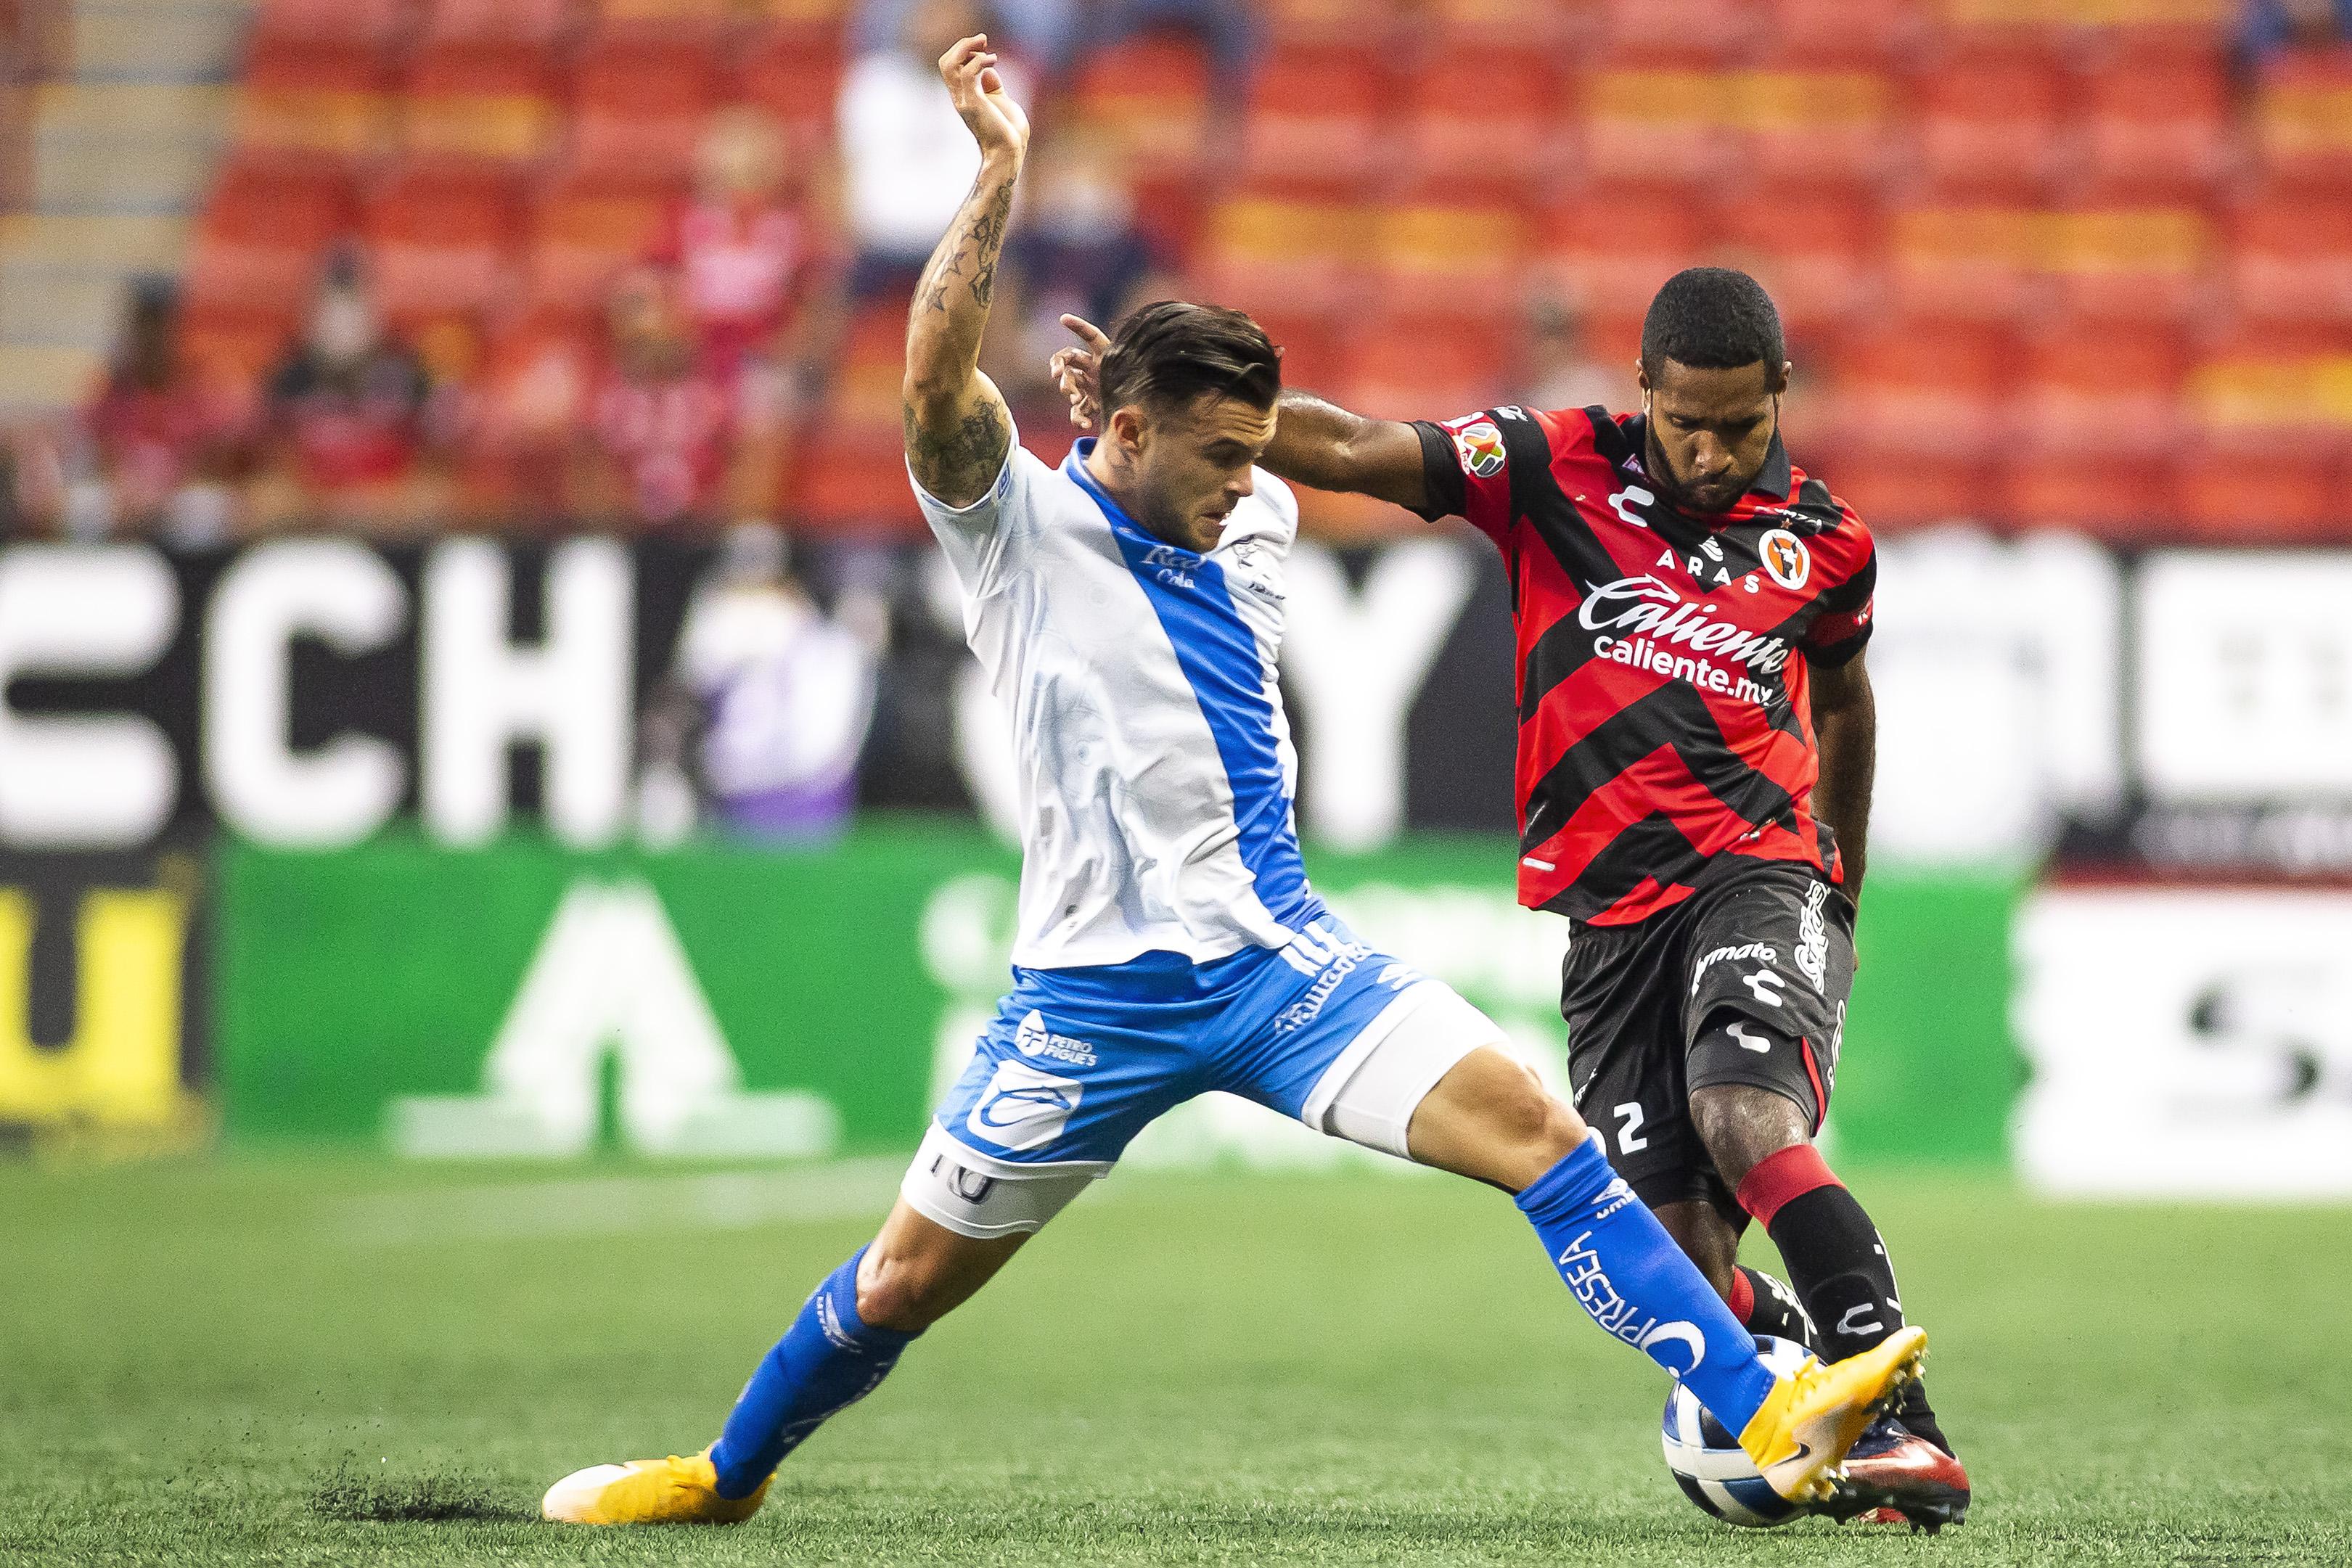 Tijuana vs Puebla 1-1 Torneo Apertura 2021